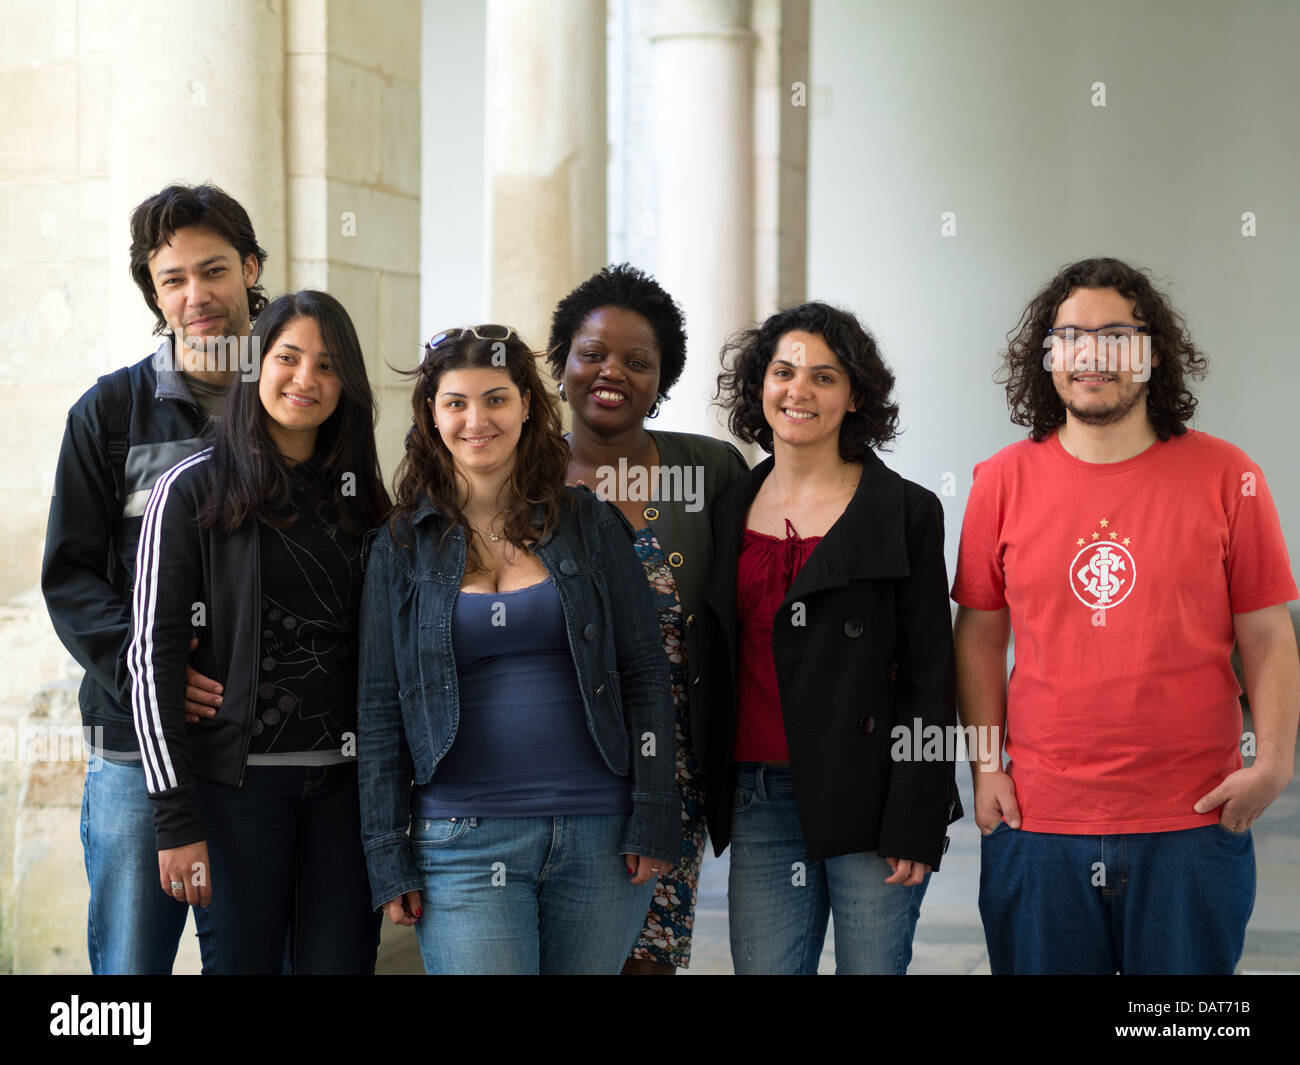 Group of multi ethnic people - Stock Image